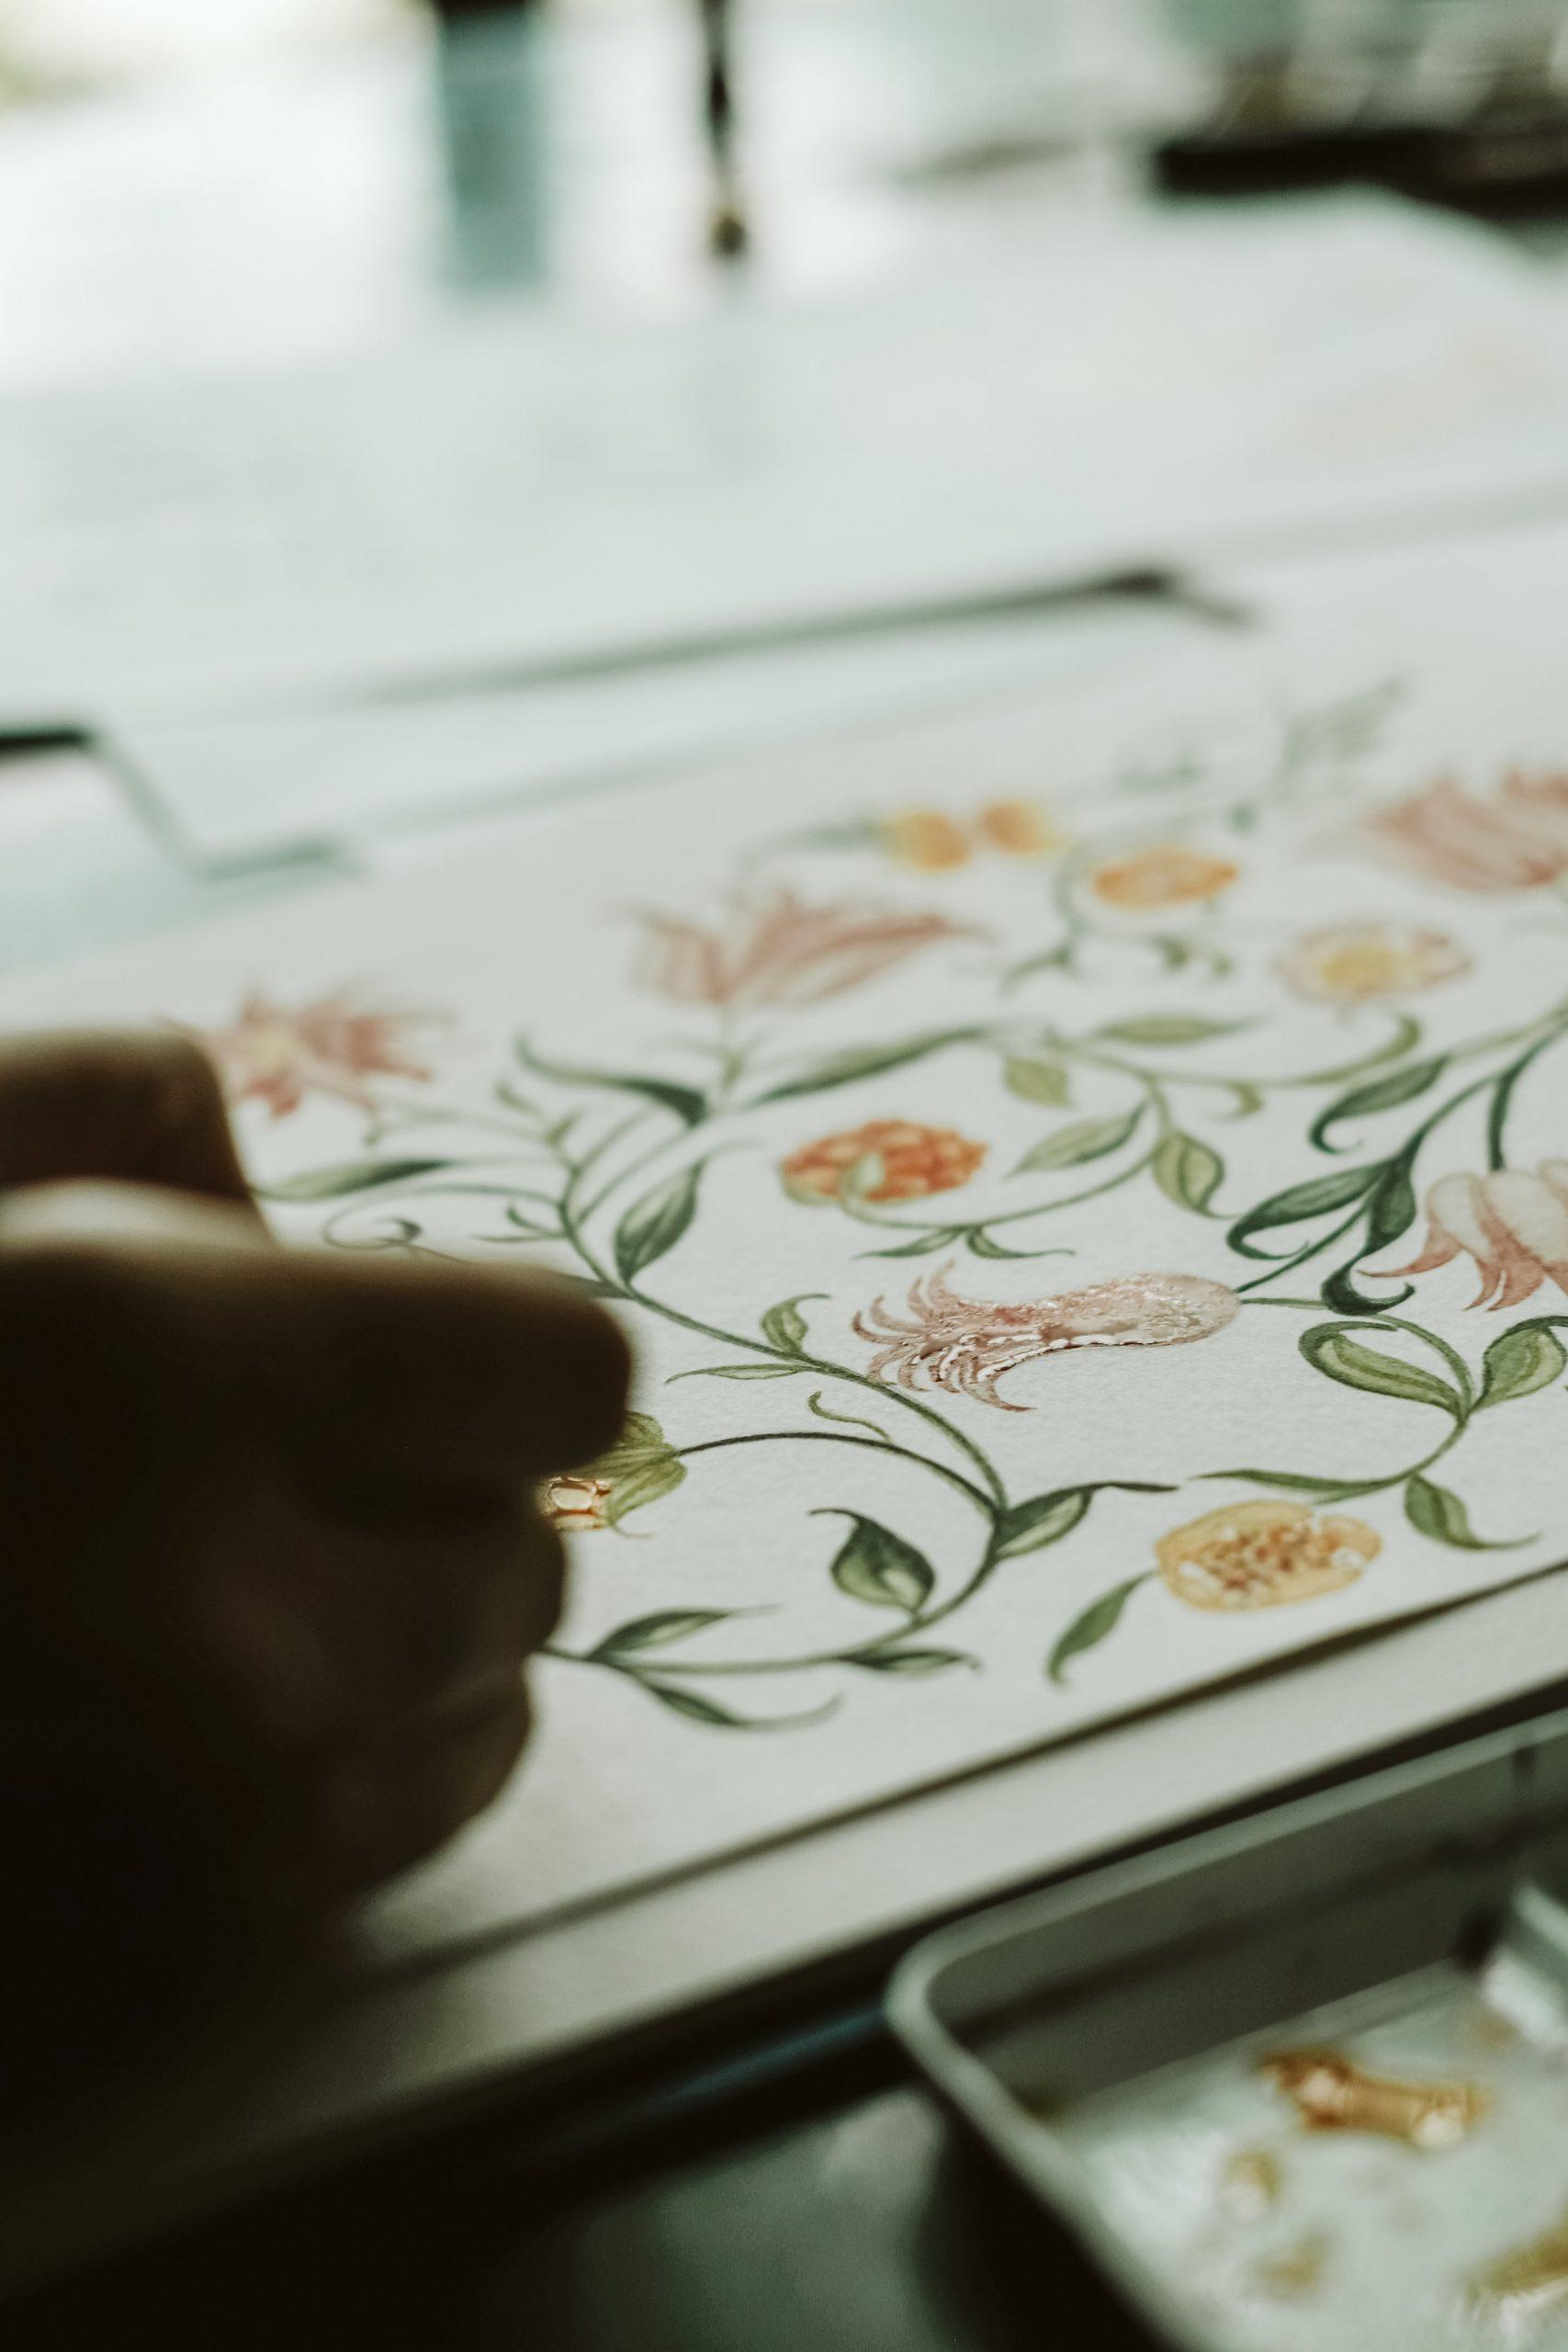 Custom made wedding invitation with watercolour flowers design